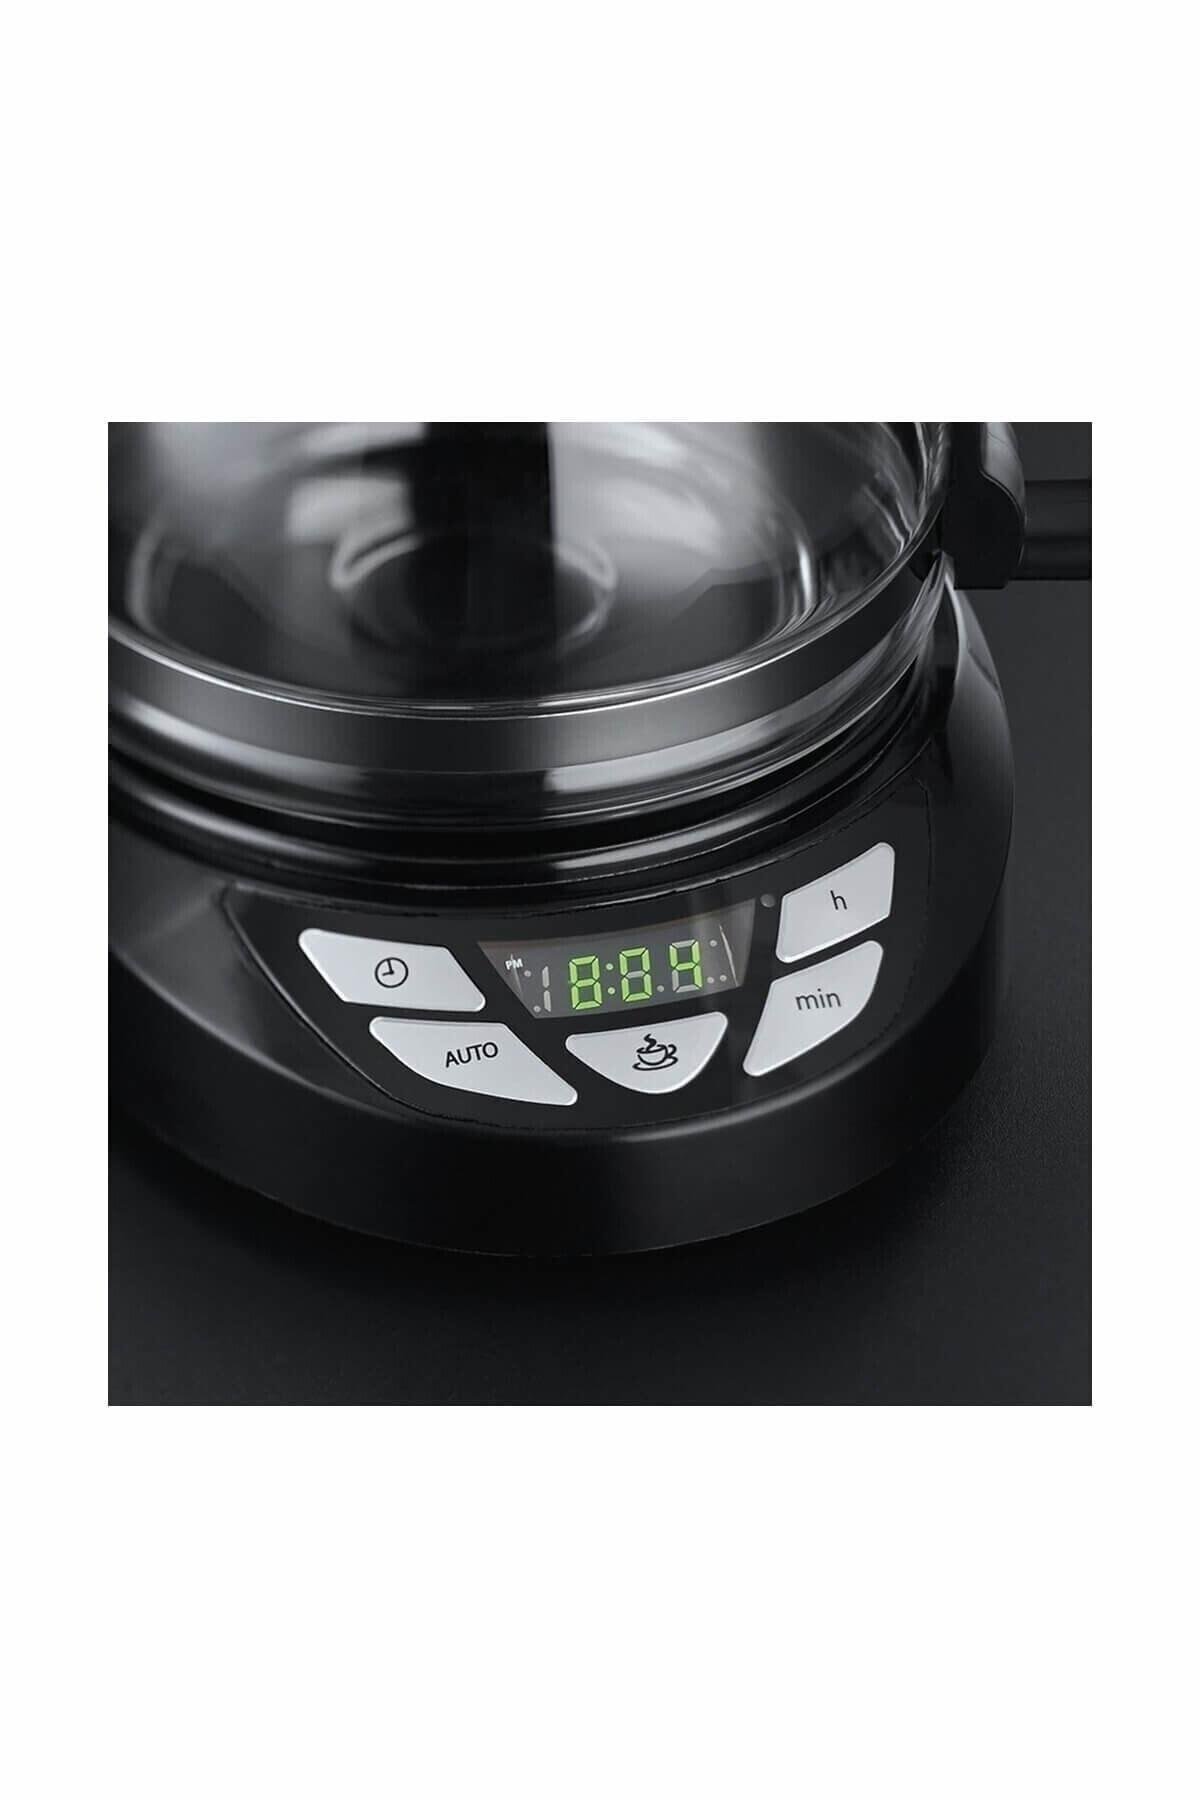 RUSSELL HOBBS Dijital Zaman Ayarlı Filtre Kahve Makinesi 2